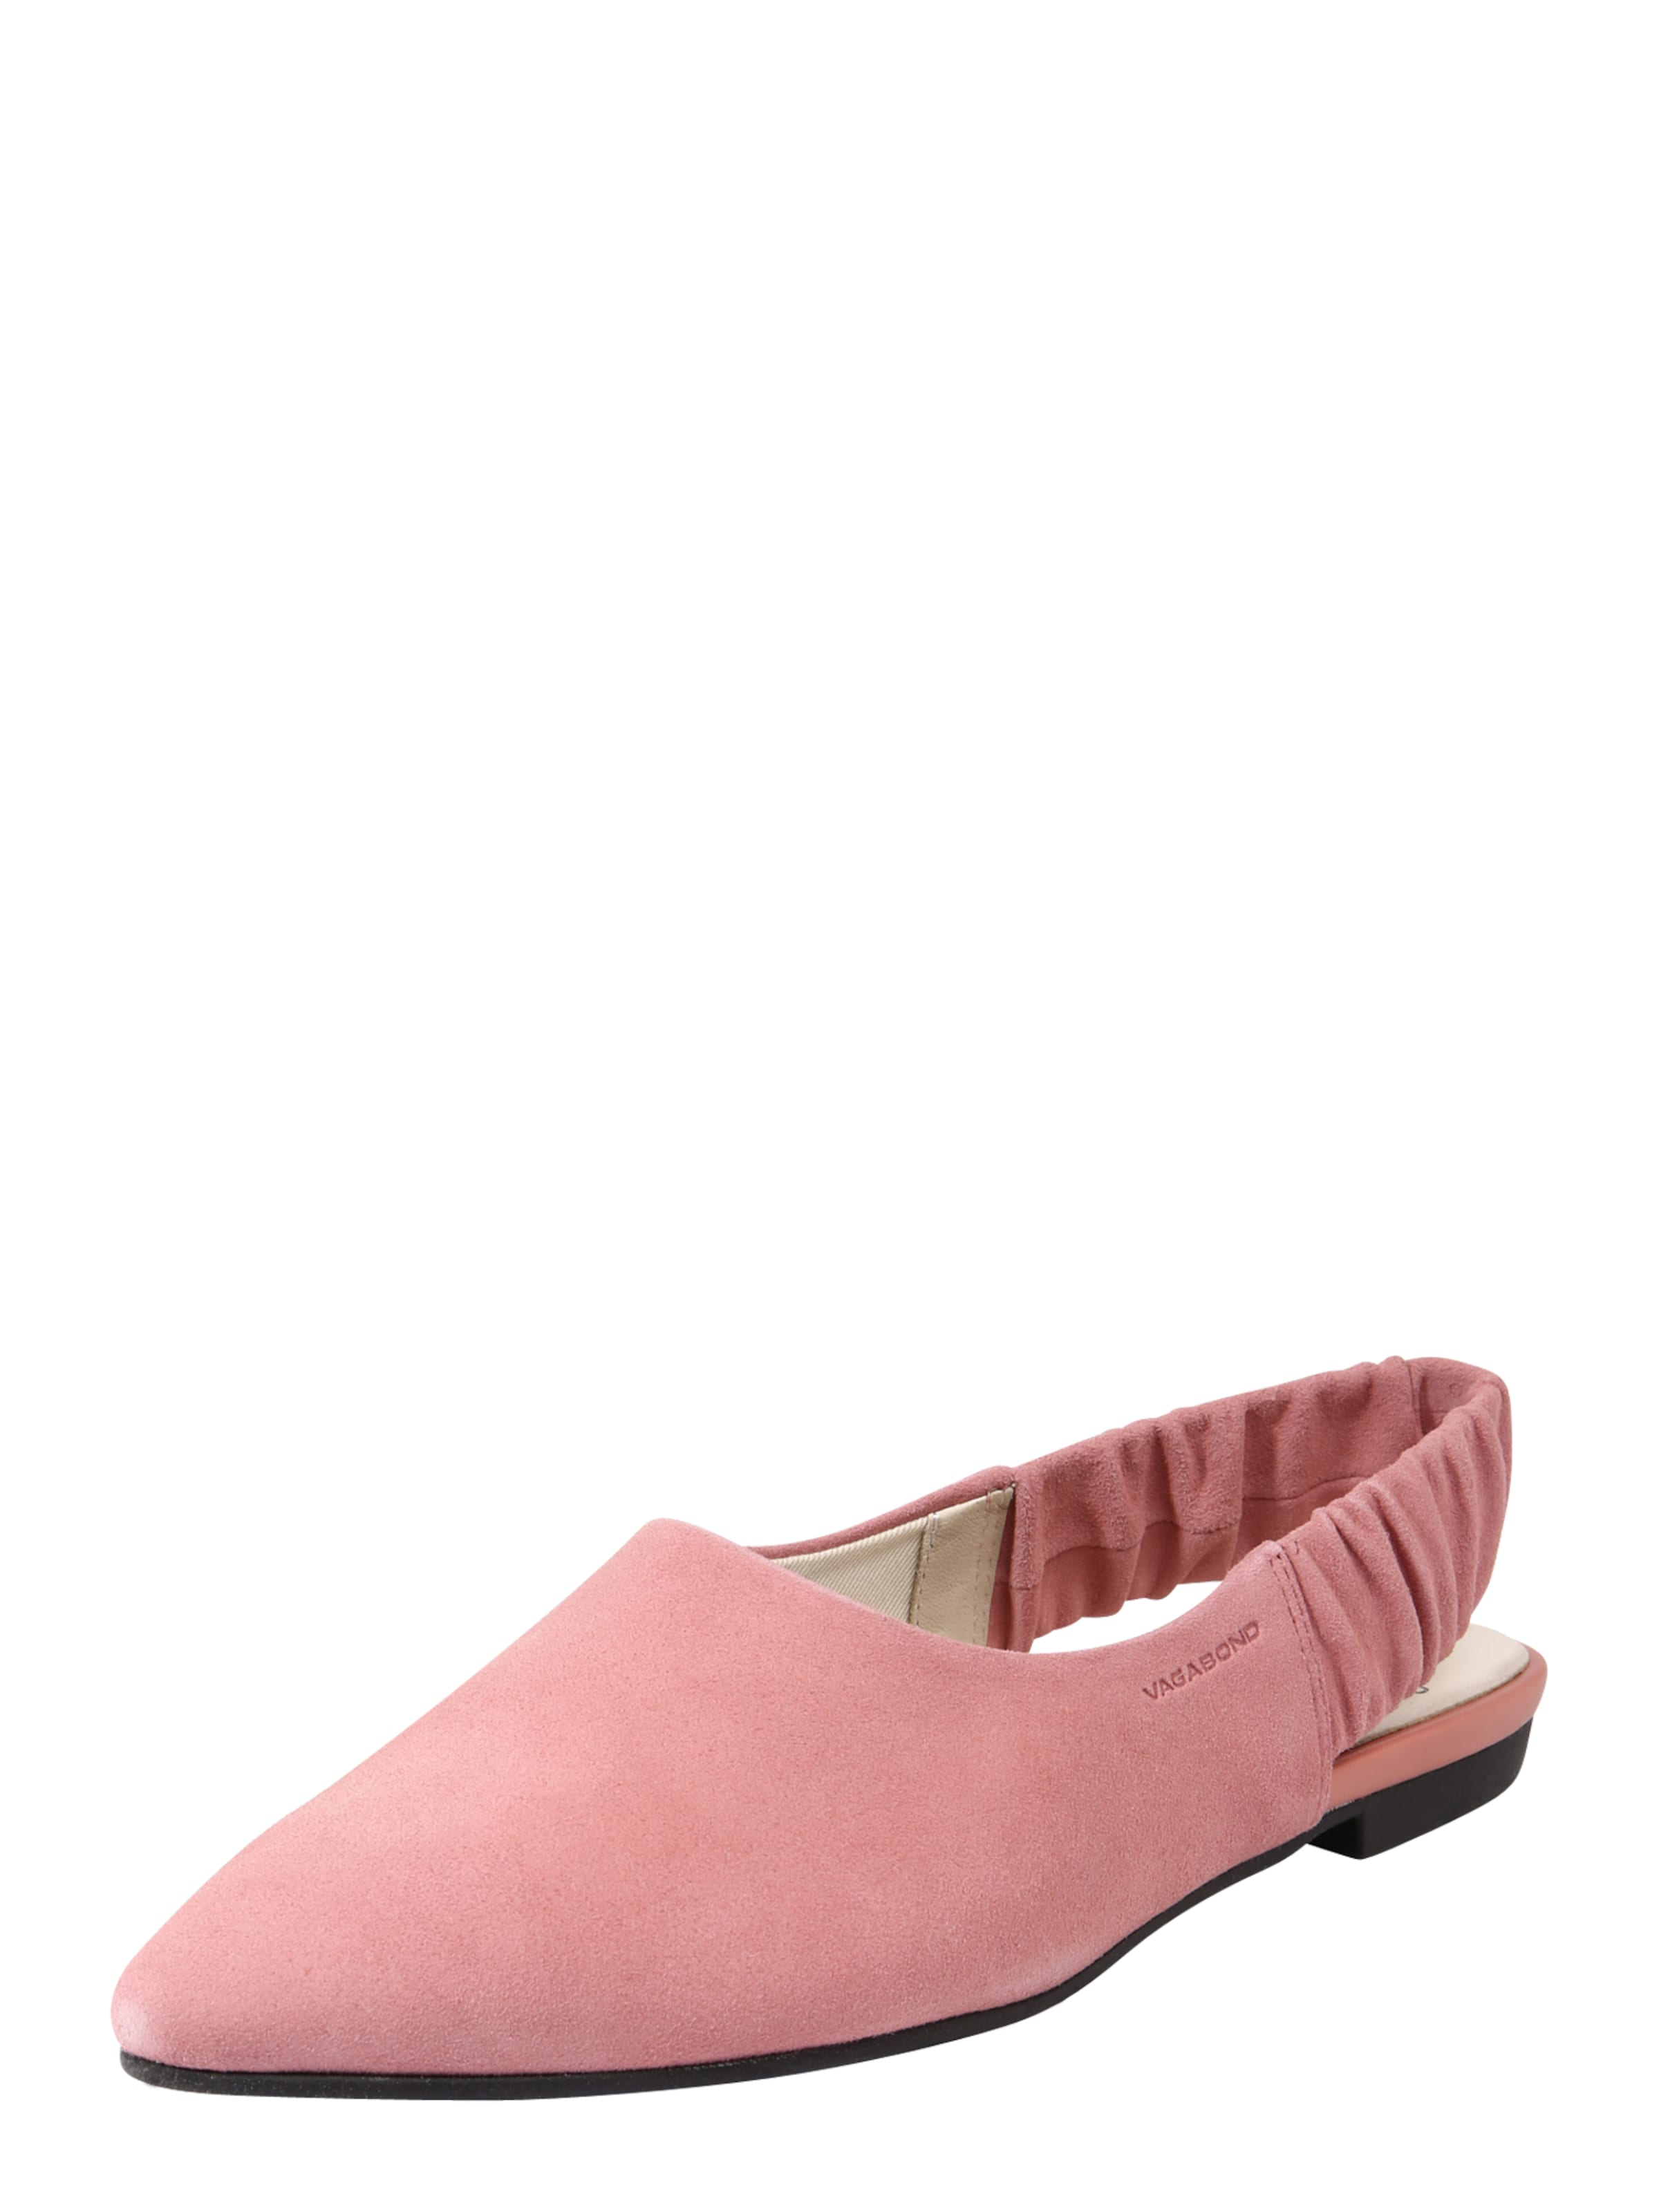 Haltbare Mode billige Schuhe VAGABOND SHOEMAKERS | Ballerina 'Katlin' Schuhe Gut getragene Schuhe